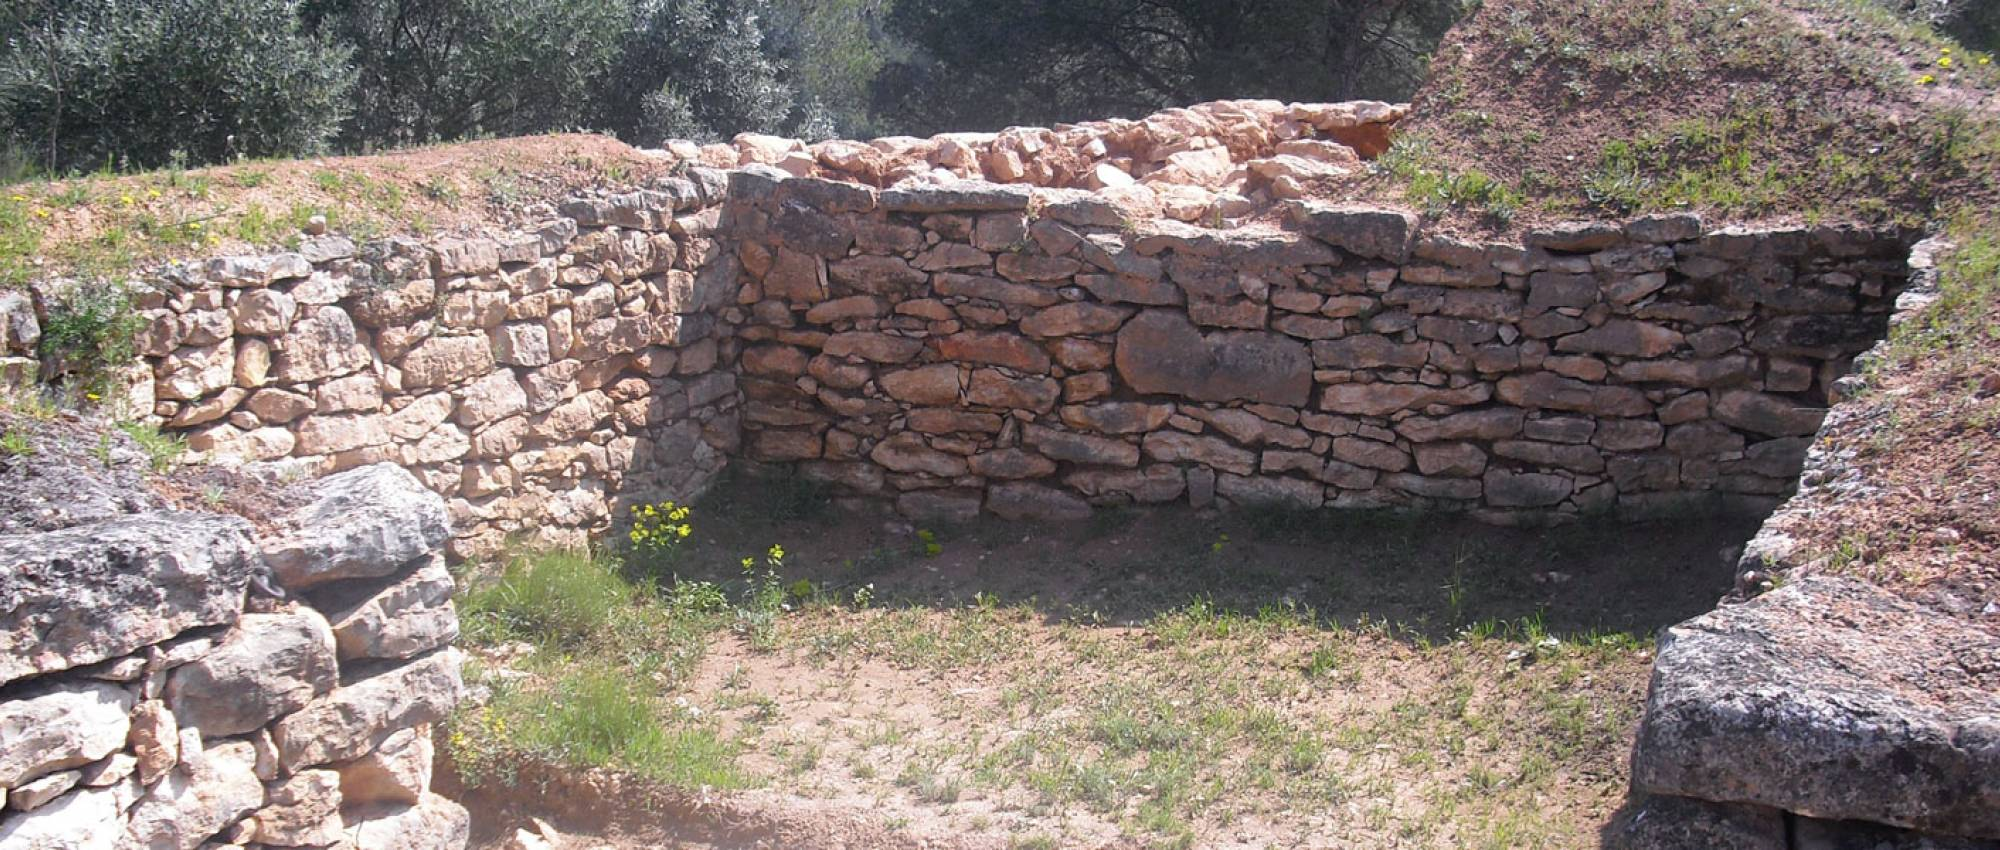 Castellet de Banyoles. El noi de la garrigo / Wikimedia Commons. Public Domain